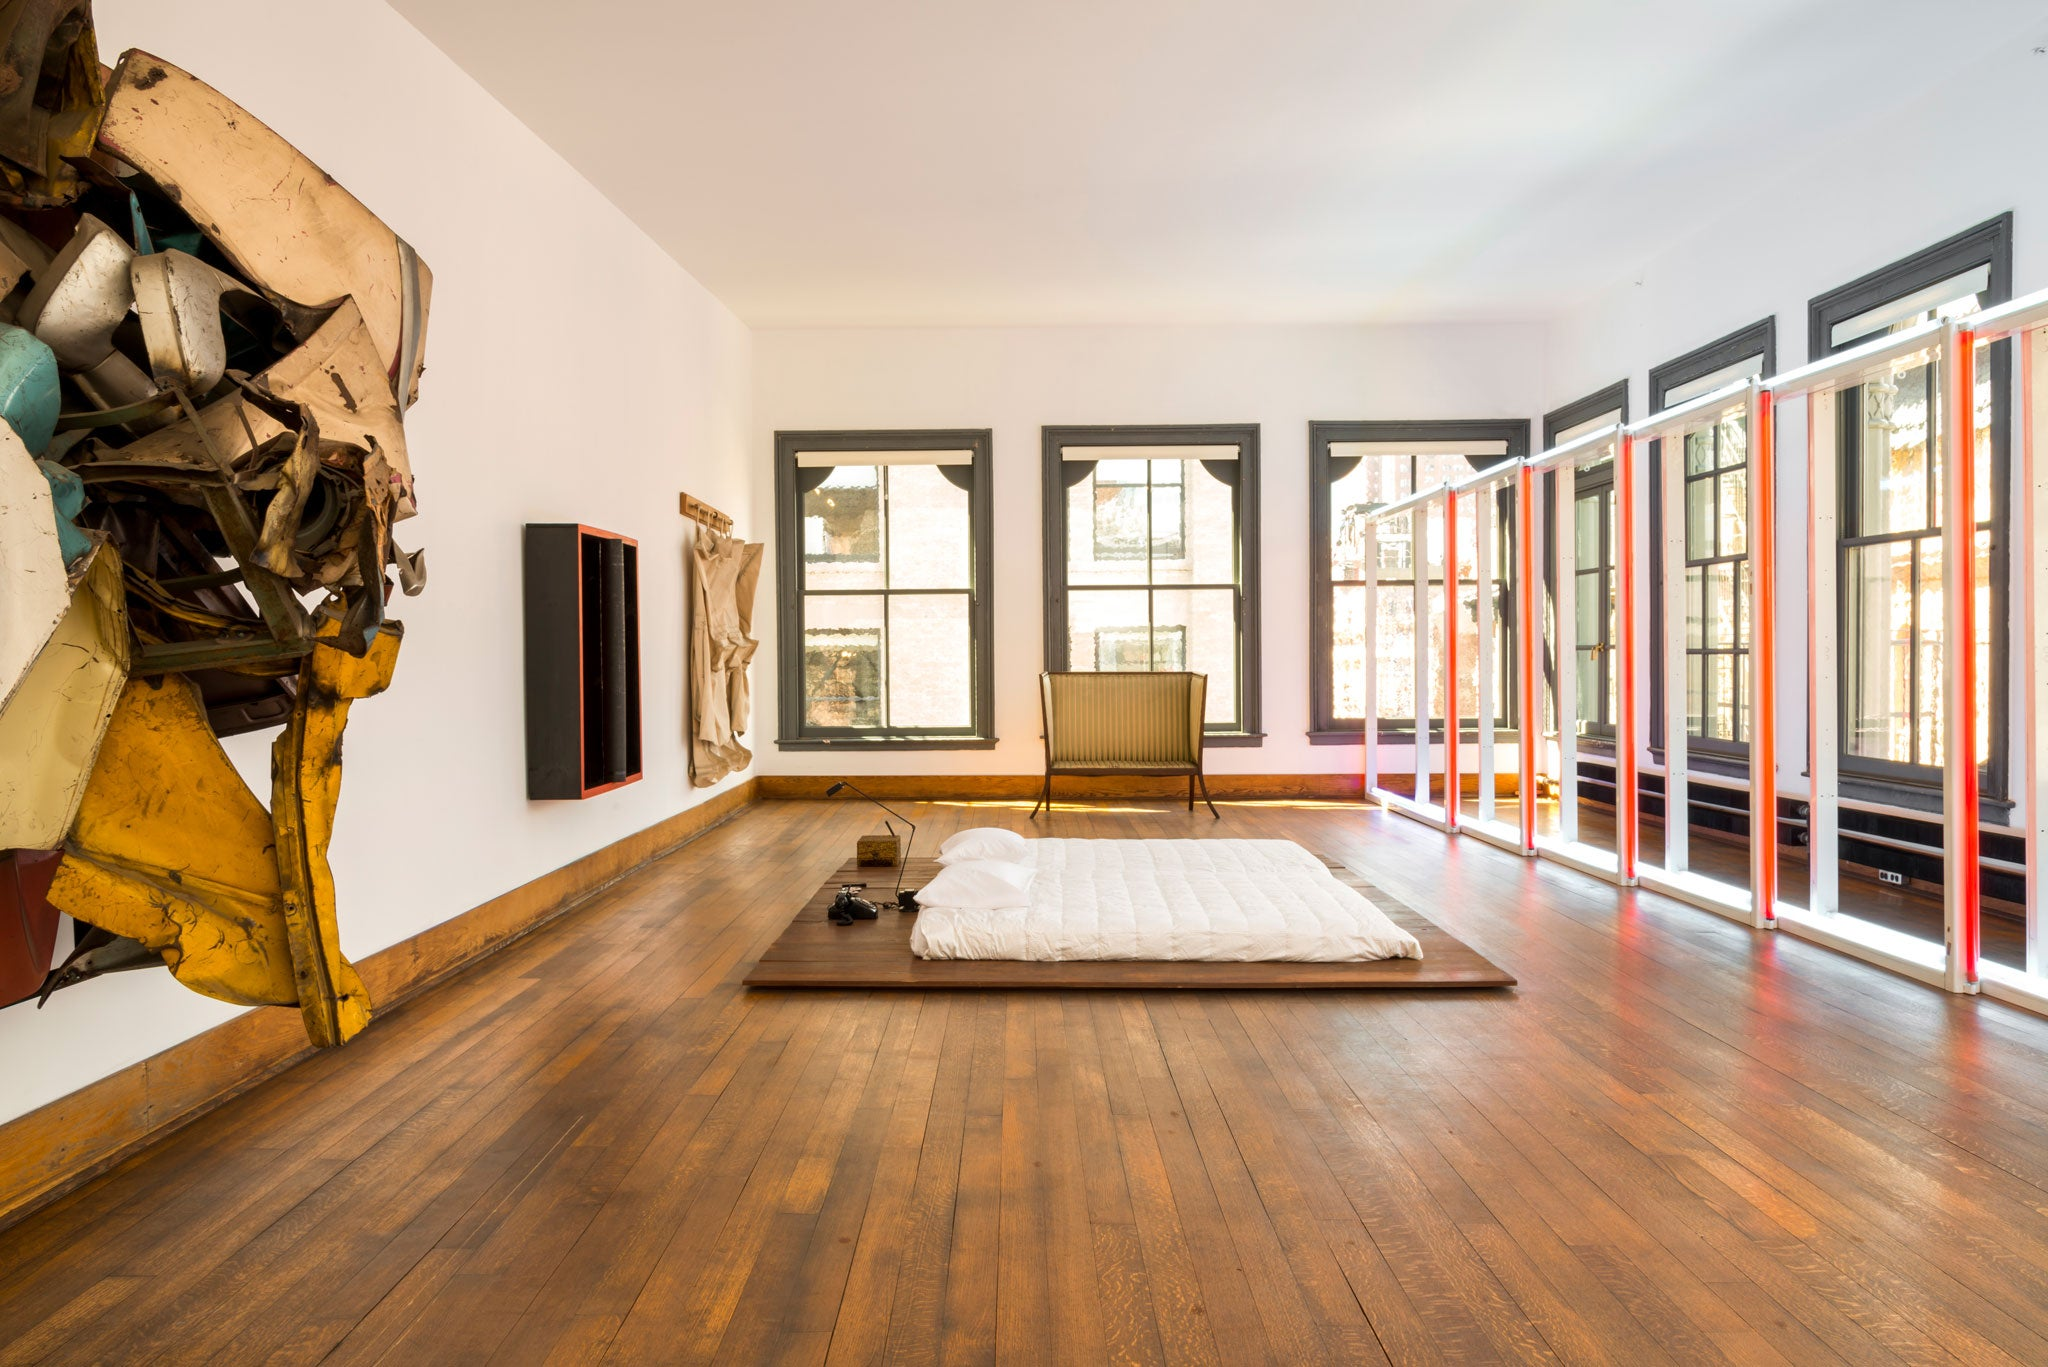 Square roots: Artist Donald Judd's New York apartment ... | 2048 x 1367 jpeg 408kB